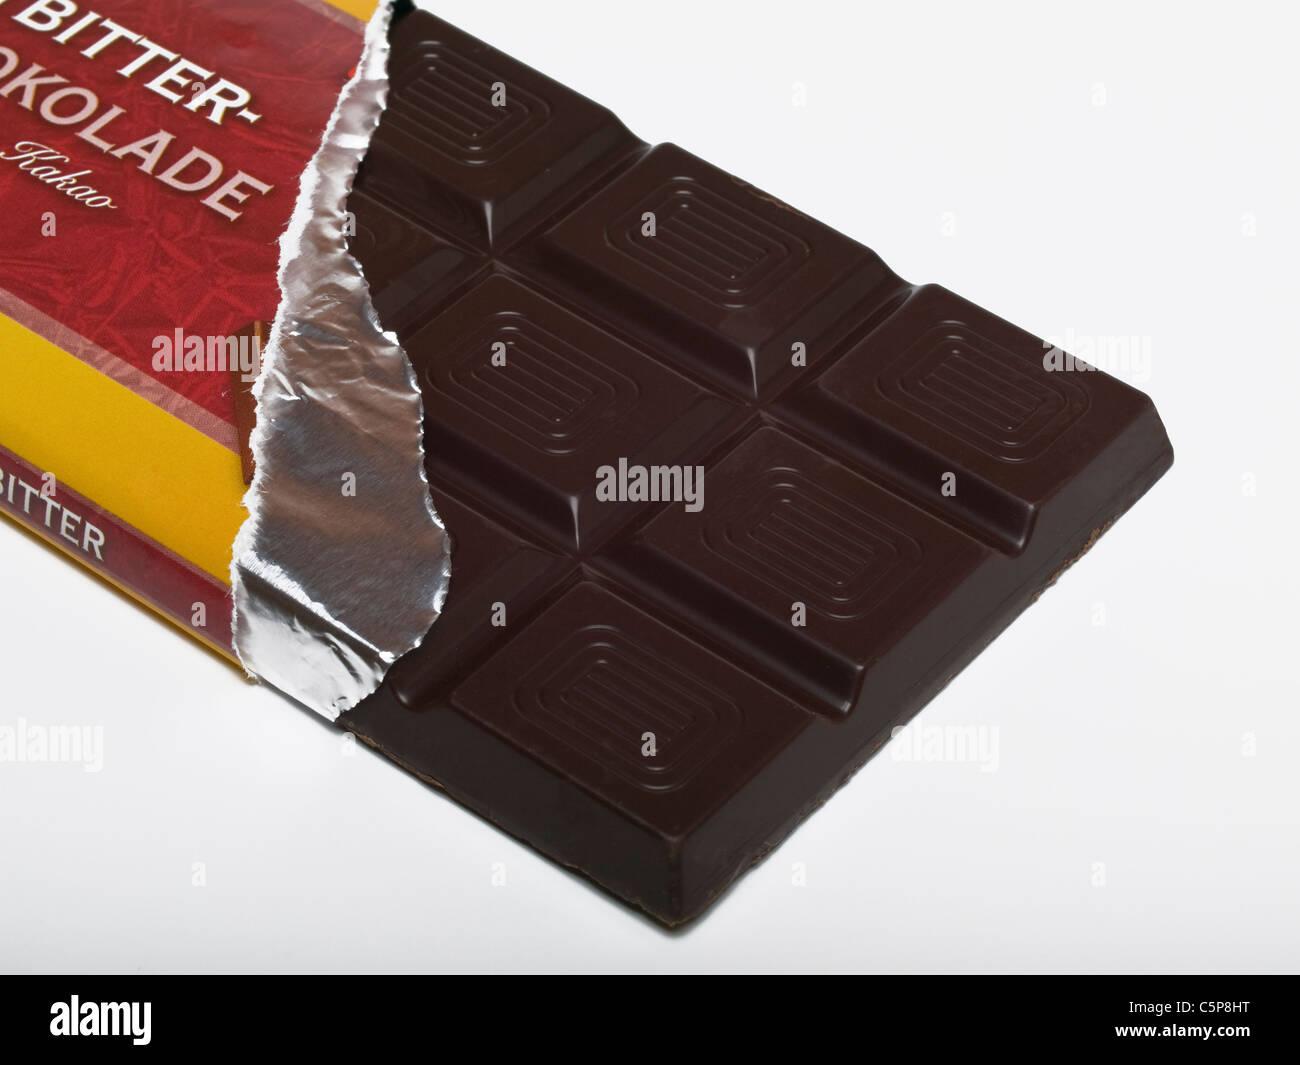 Detailphoto einer Tafel Bitterschokolade   Dettaglio foto di un Dark chocolate bar Immagini Stock